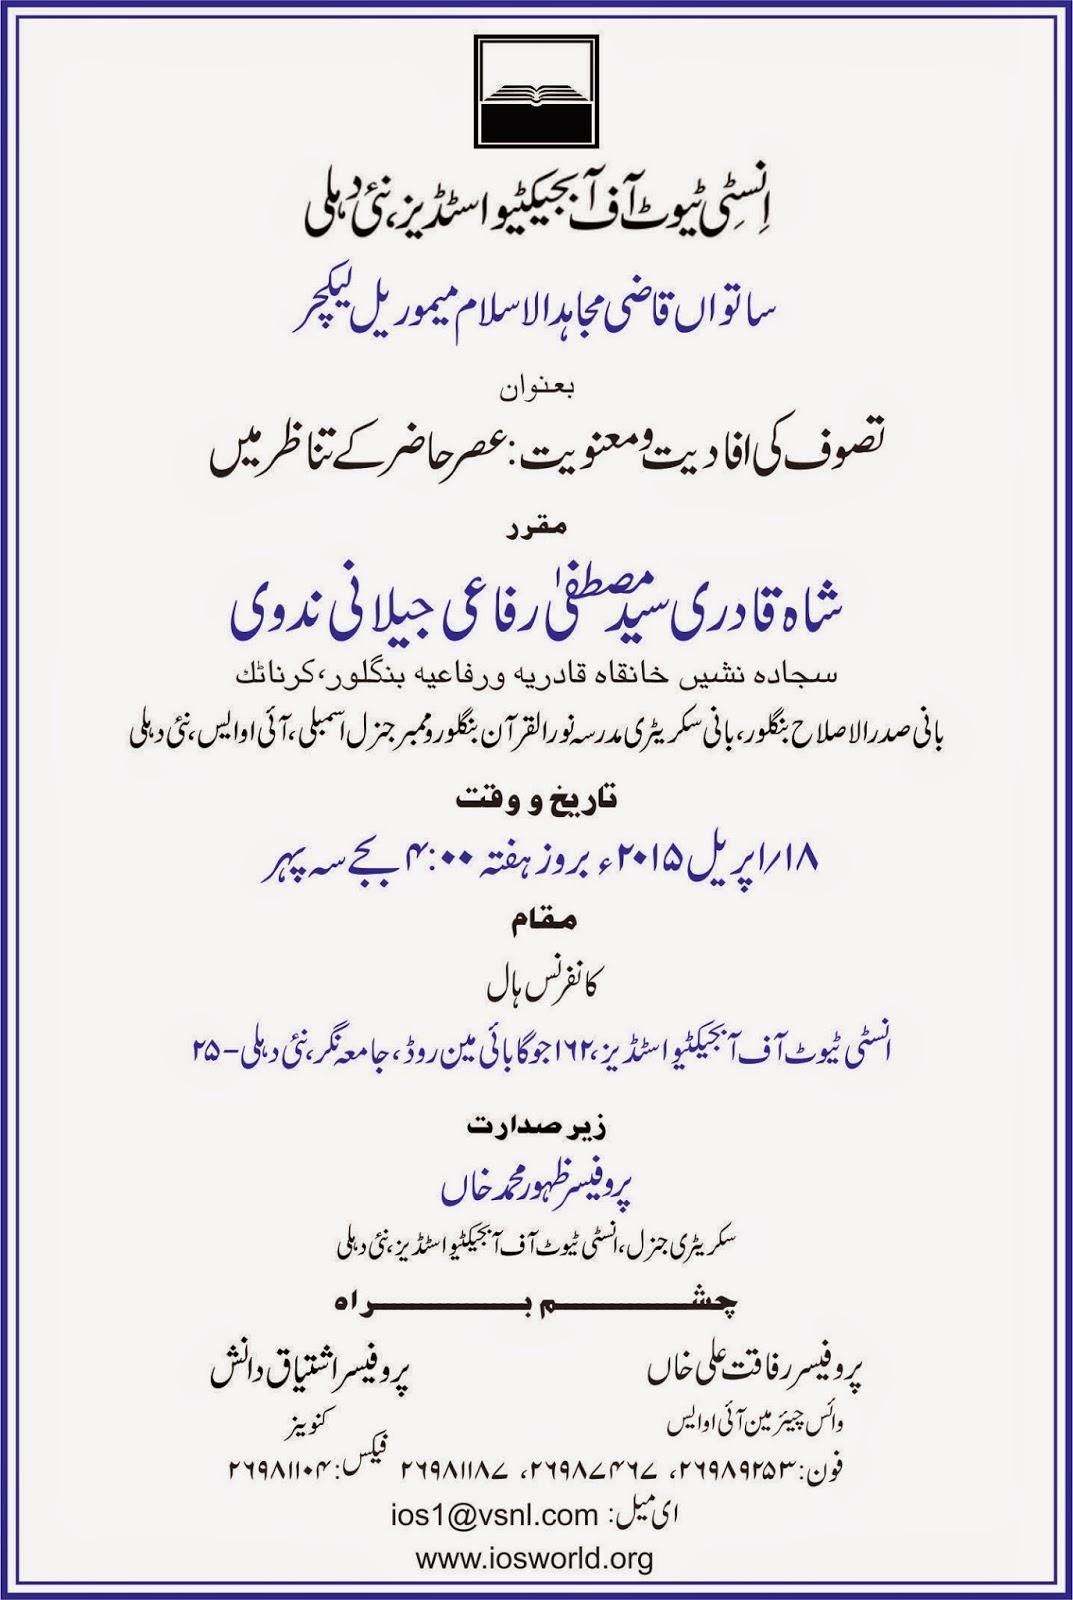 Wedding invitation wording in urdu 28 images jameel aahmed wedding invitation wording in urdu jameel aahmed milansaar april 2015 stopboris Image collections